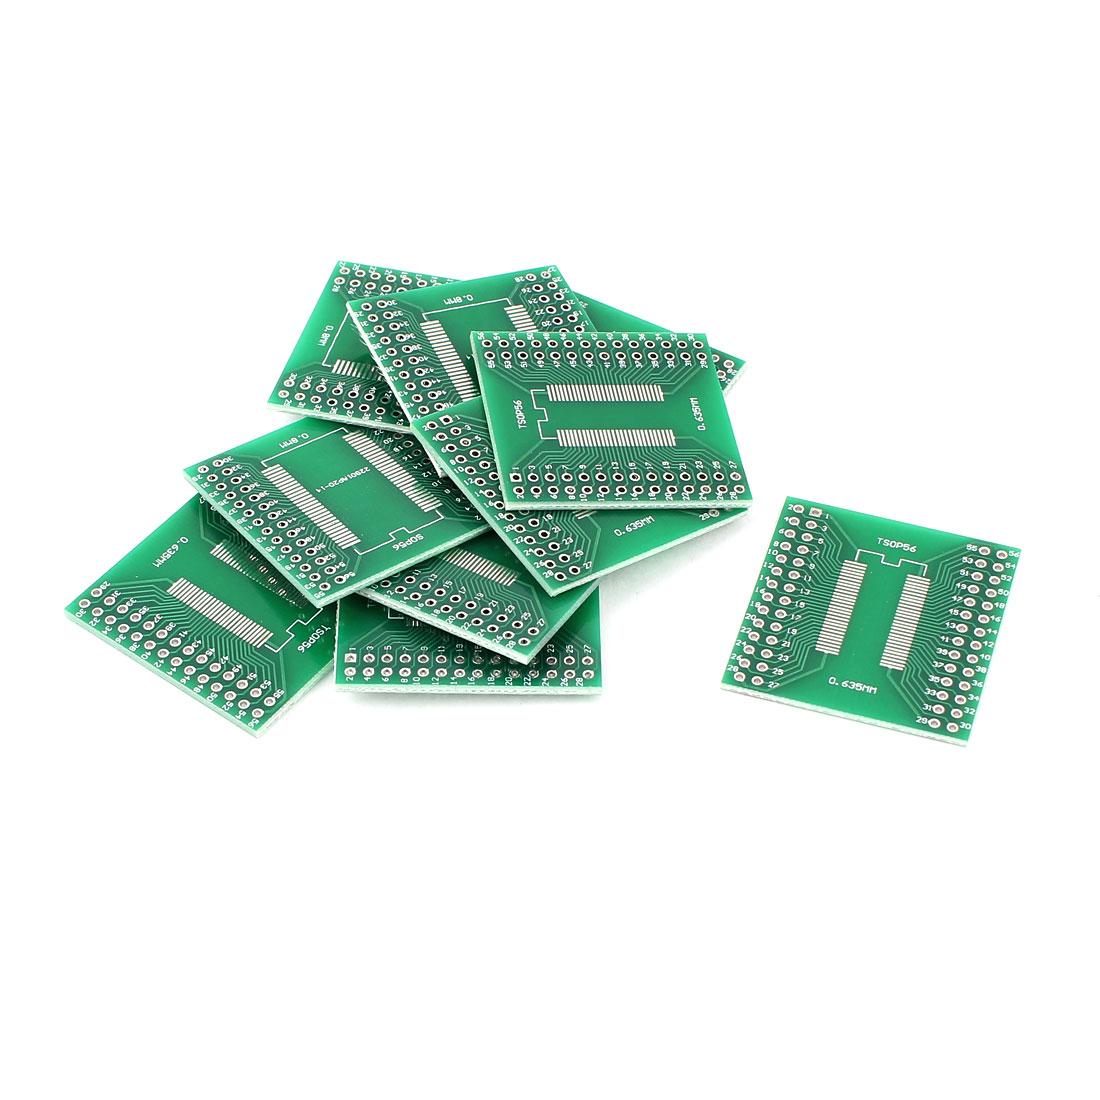 10Pcs 0.635mm 0.8mm SSOP56 TSSOP56 to 2.54mm DIP56 SMD IC PCB Adapter Socket